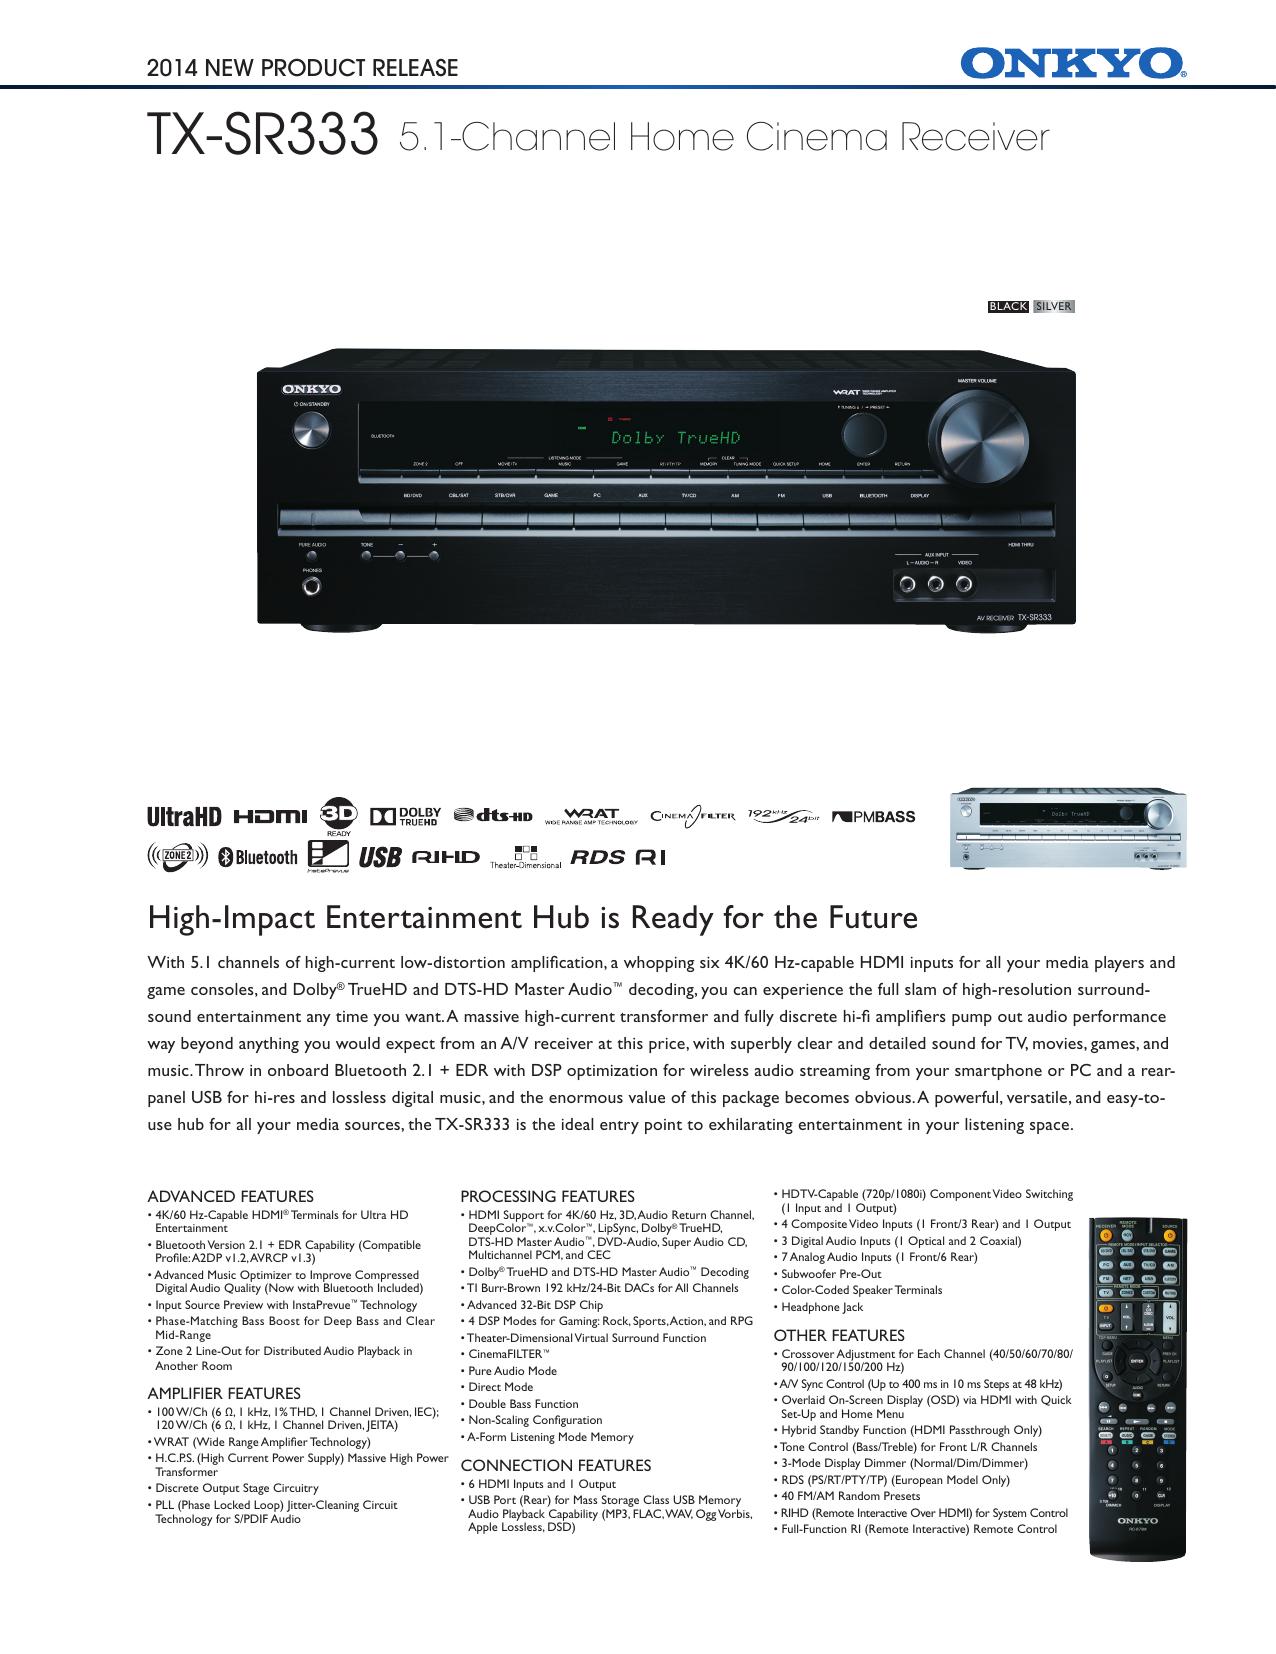 TX-SR333 5 1-Channel Home Cinema Receiver   manualzz com